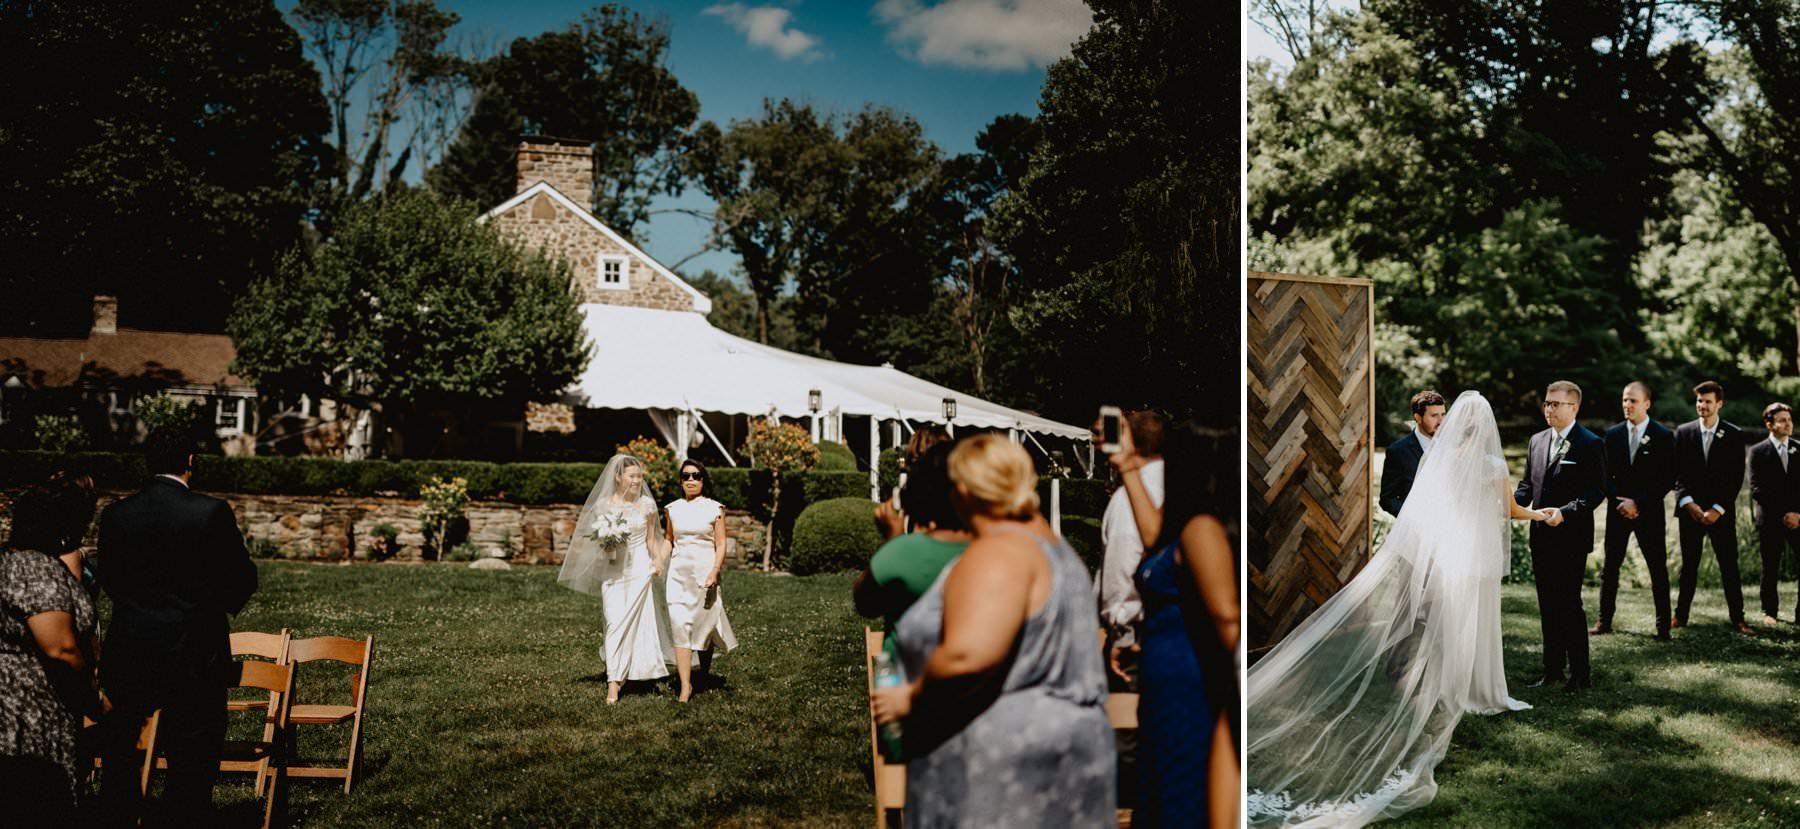 Appleford-estate-wedding-83.jpg